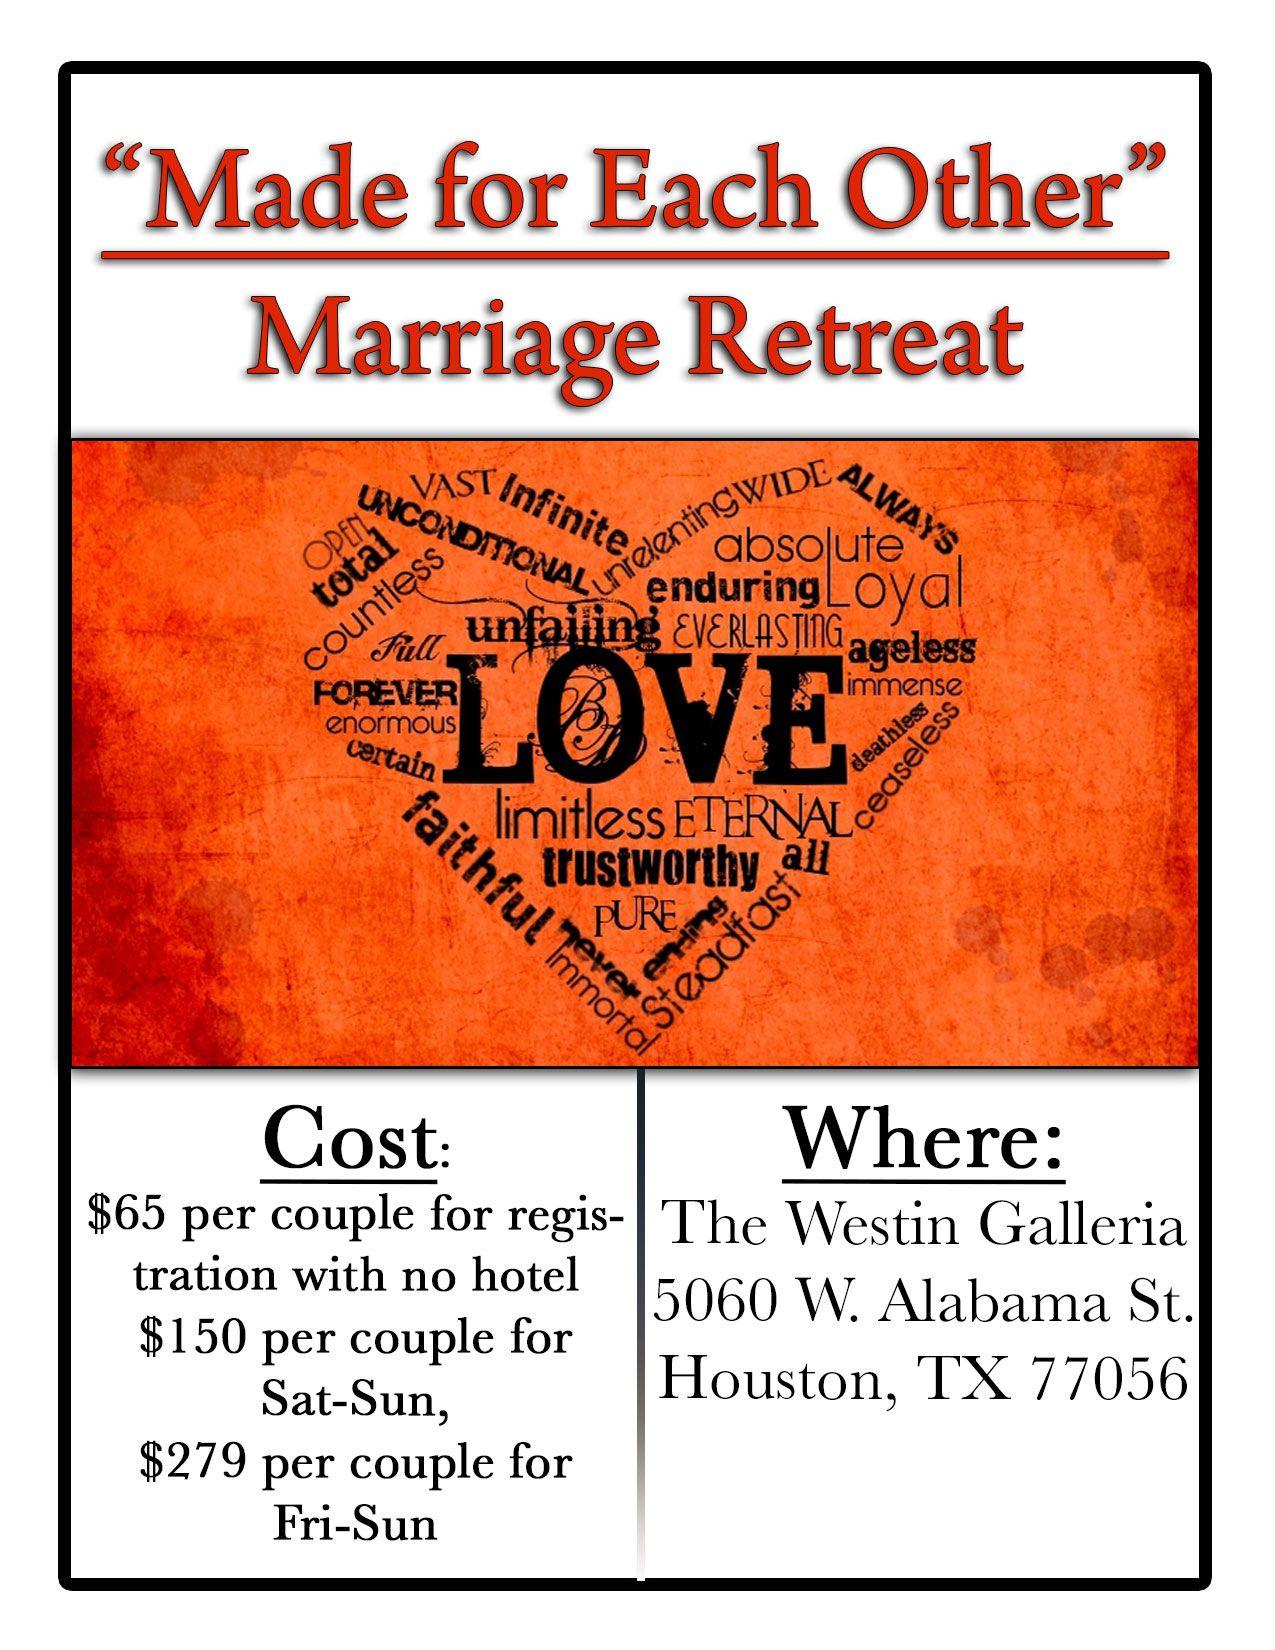 Marriage Retreat Idea Marriage Retreats Couples Retreats Couples Dinner